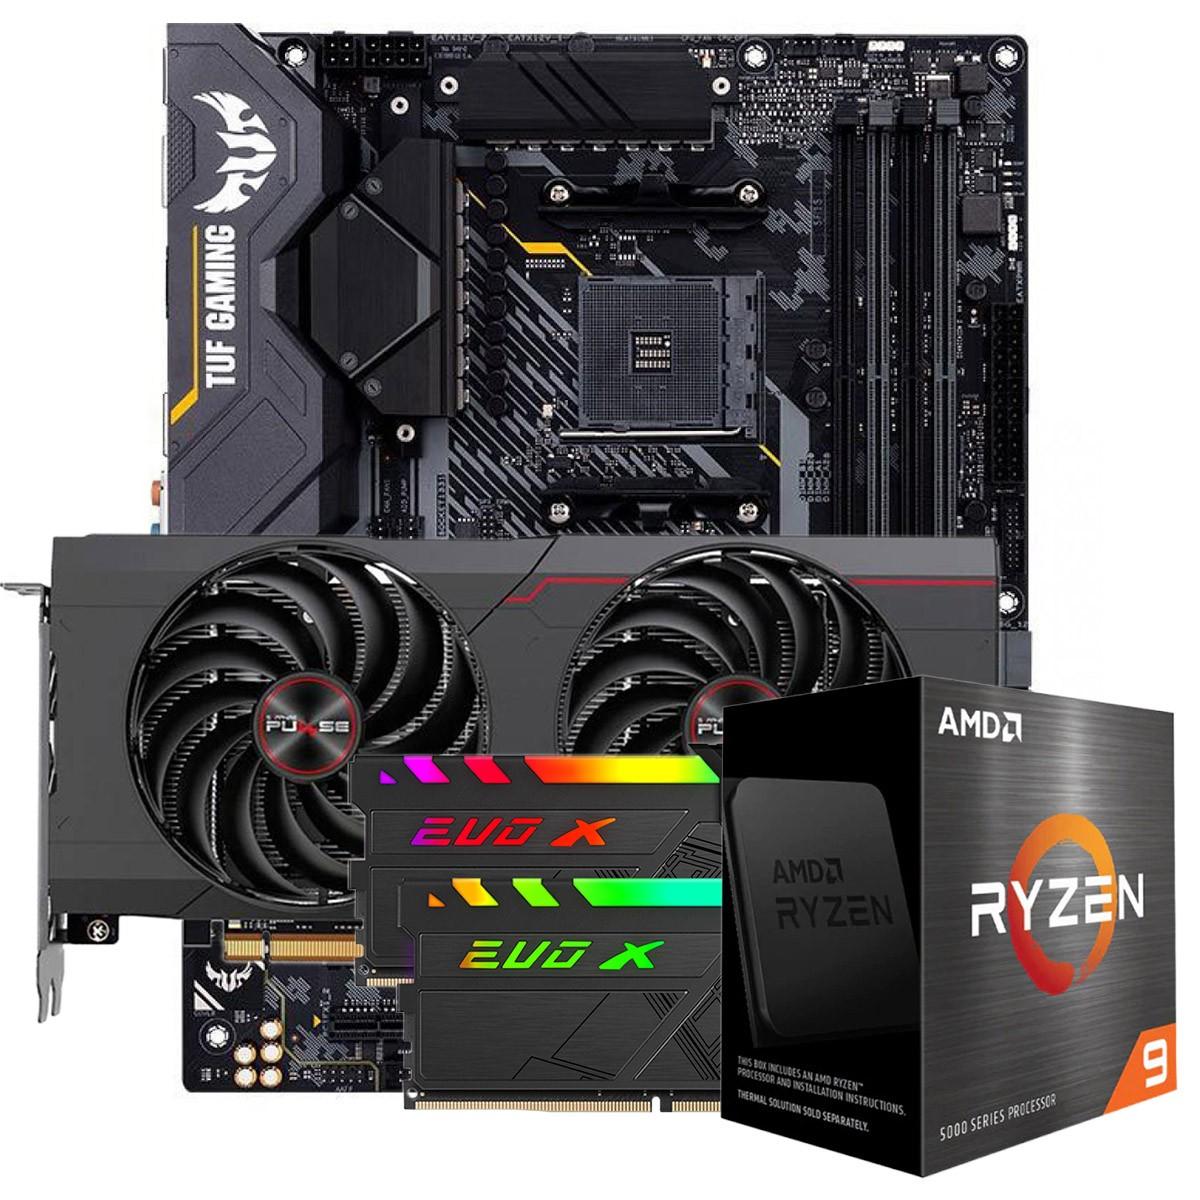 Kit Upgrade Sapphire Pulse Radeon RX 6700 XT + AMD Ryzen 9 5900X + ASUS TUF Gaming X570-Plus + Memória DDR4 16GB (2x8GB) 3600MHz